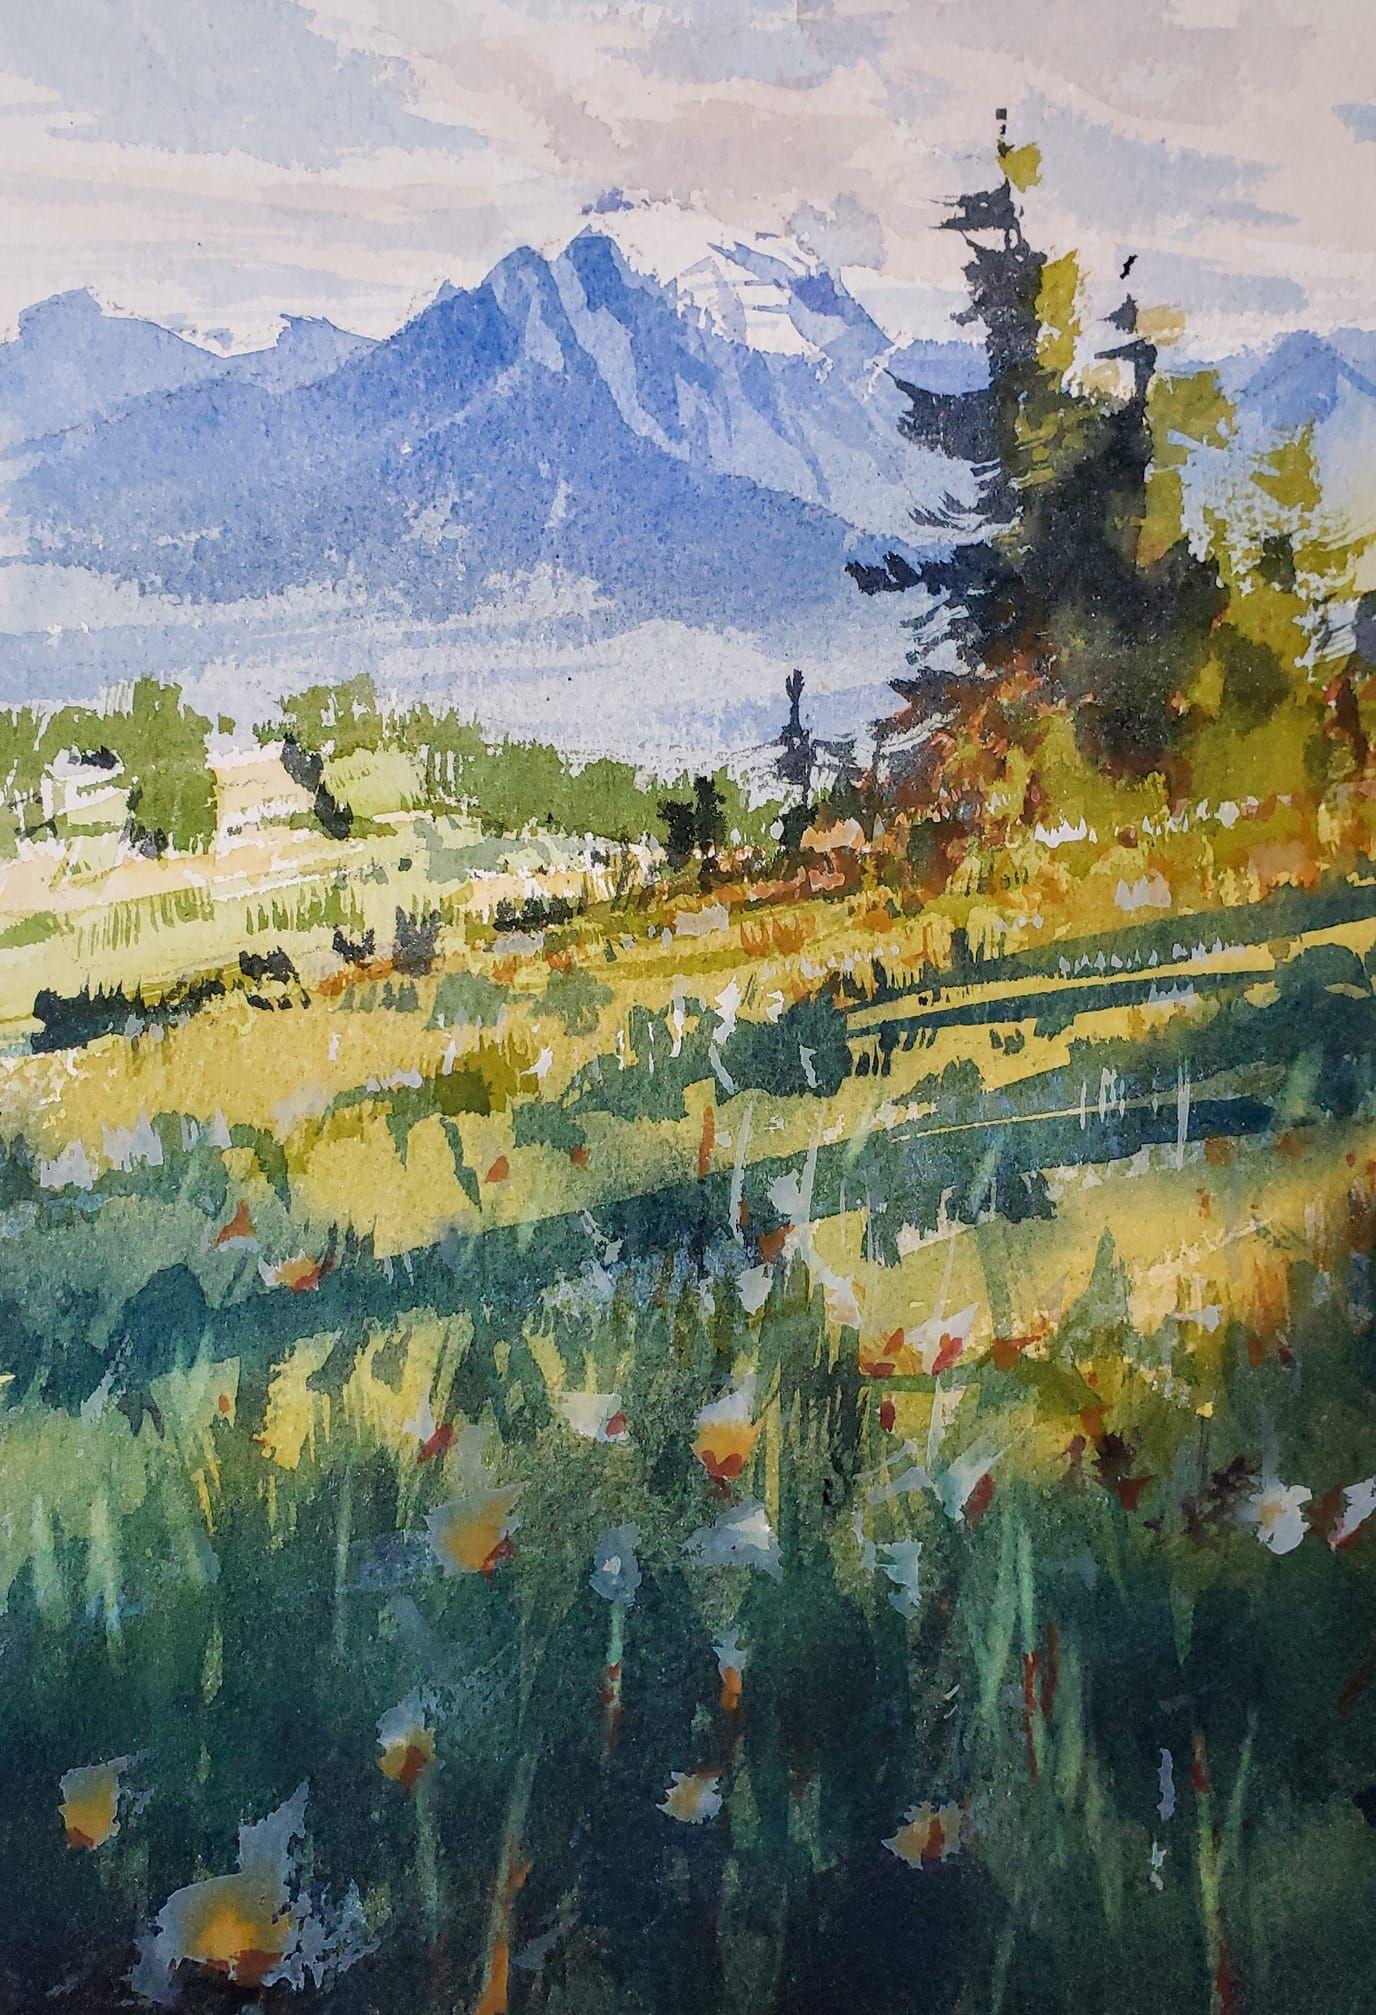 Yong Hong Zhong More Plein Air Painting From Banff National Park In Alberta Canada Arte De Acuarela Paisajes Acuarela Acuarela